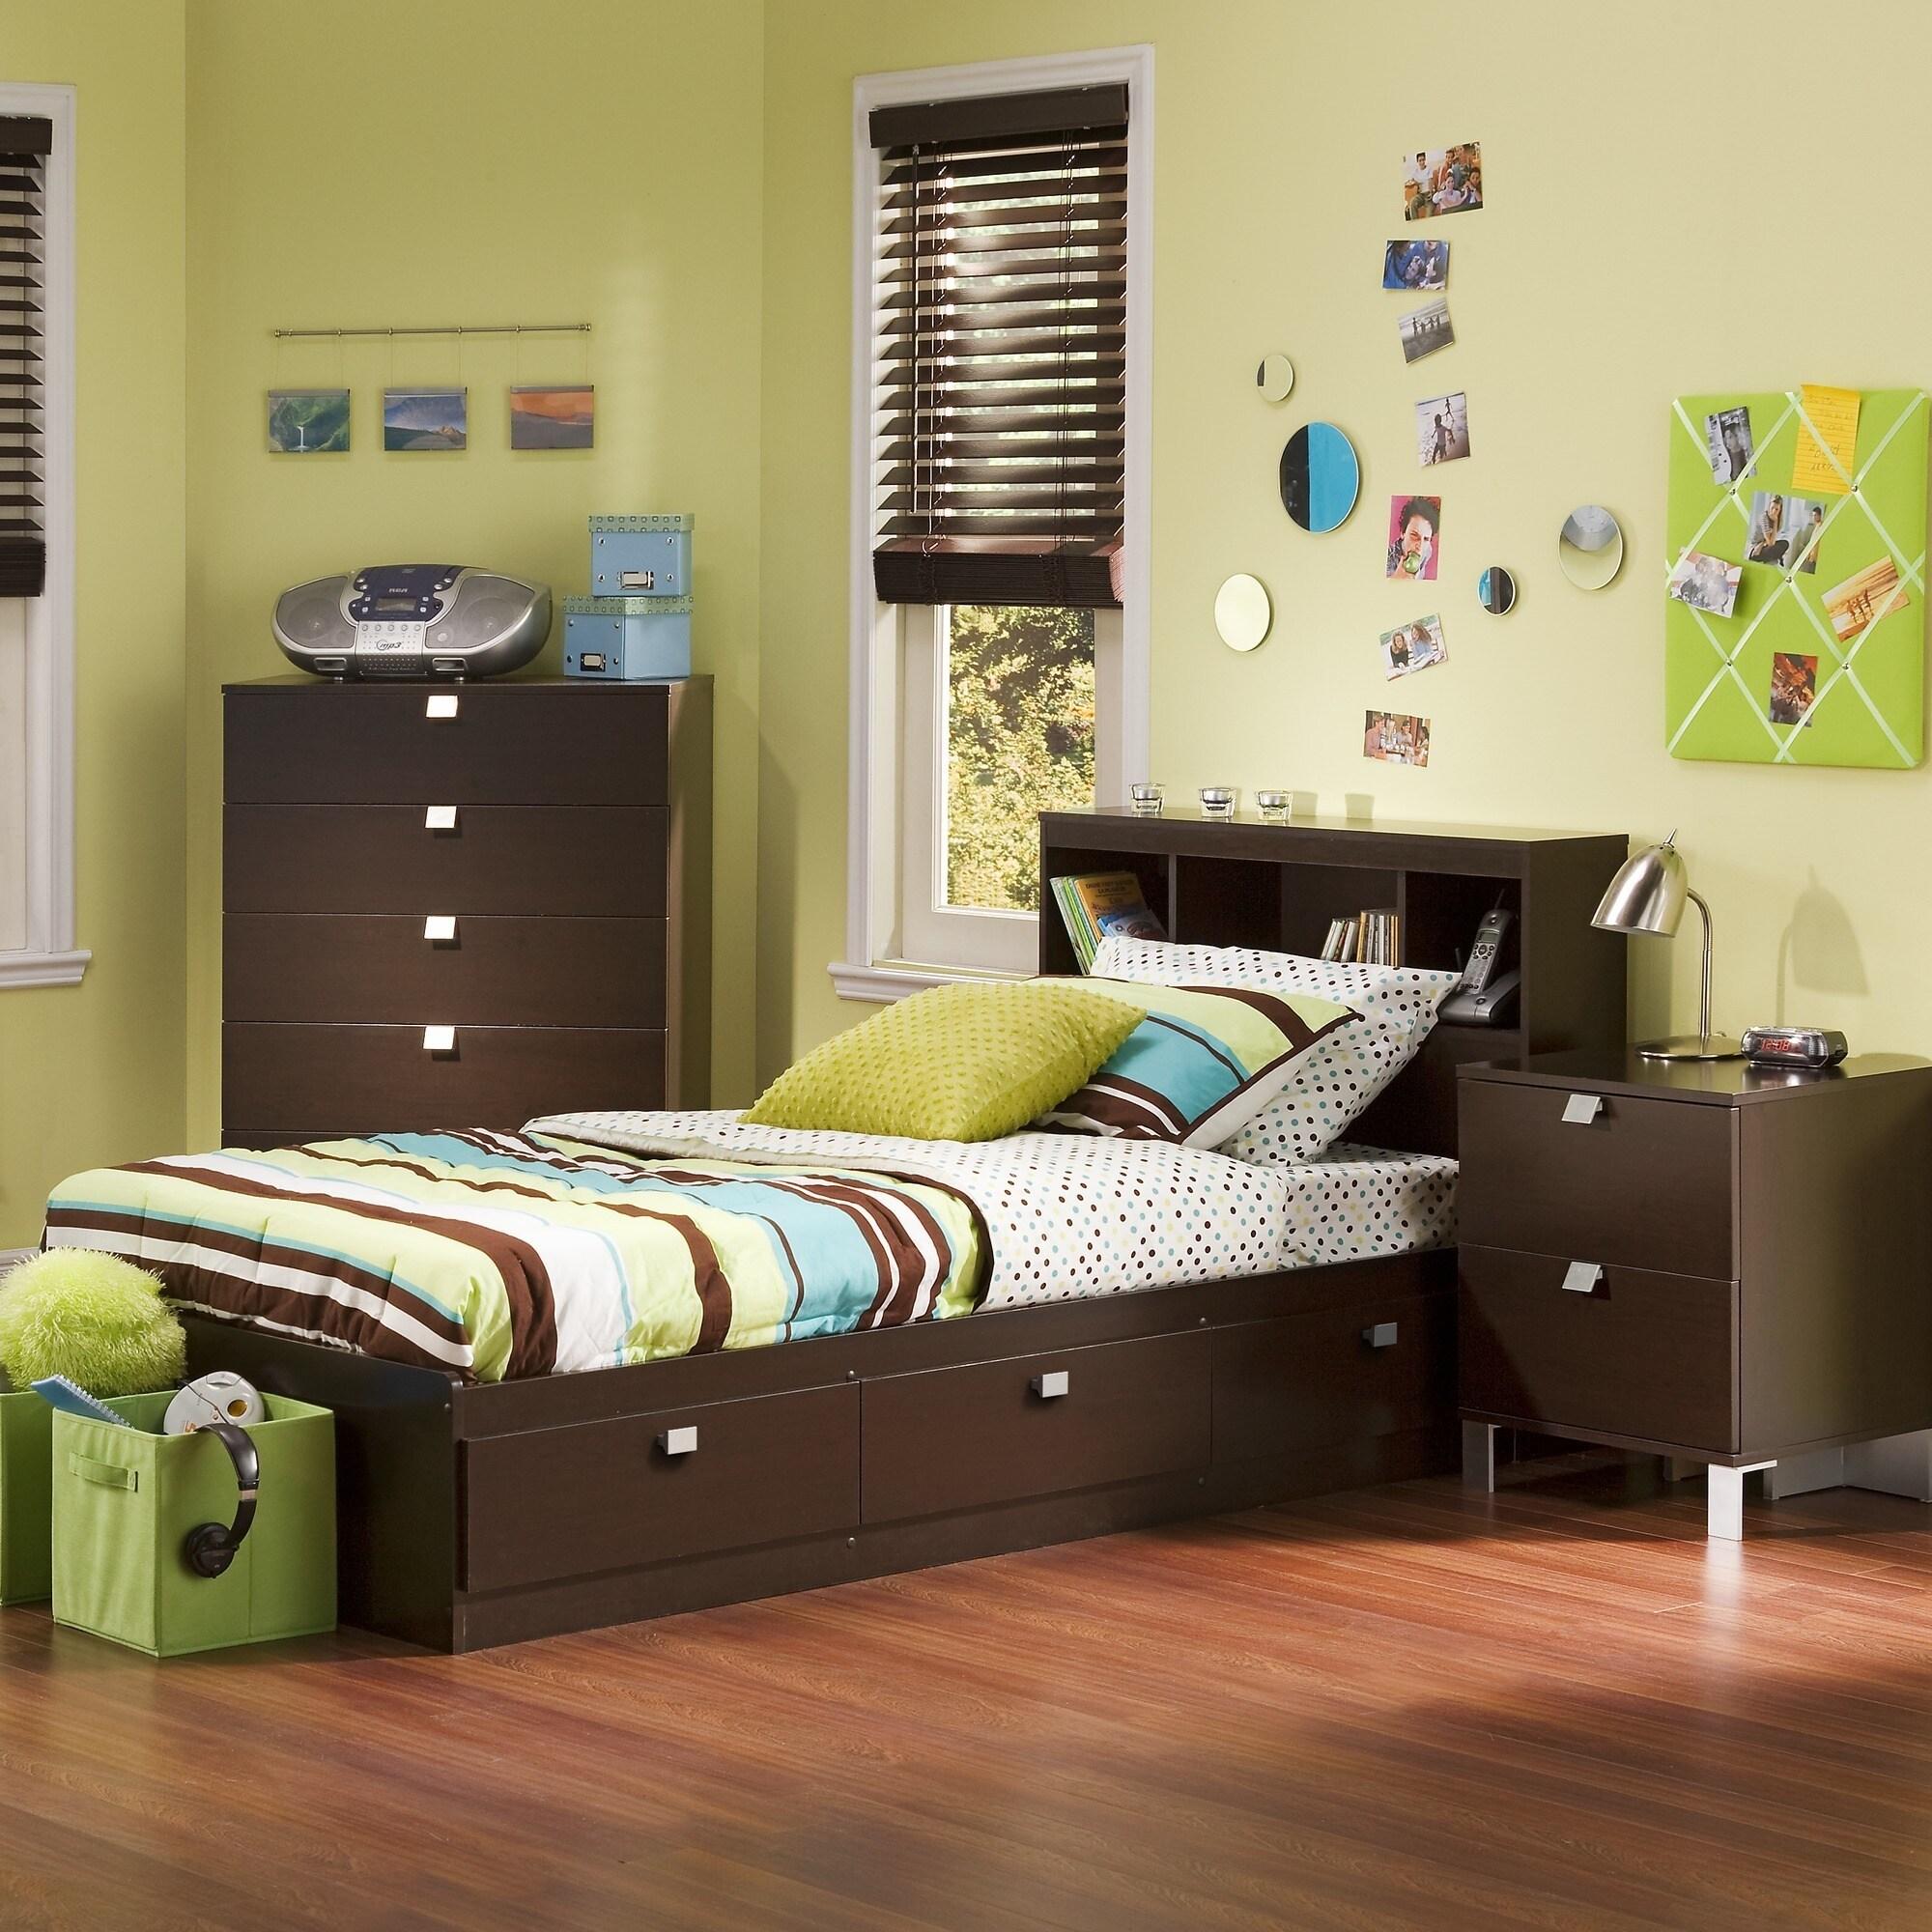 buy kids bedroom sets online at overstock our best kids rh overstock com